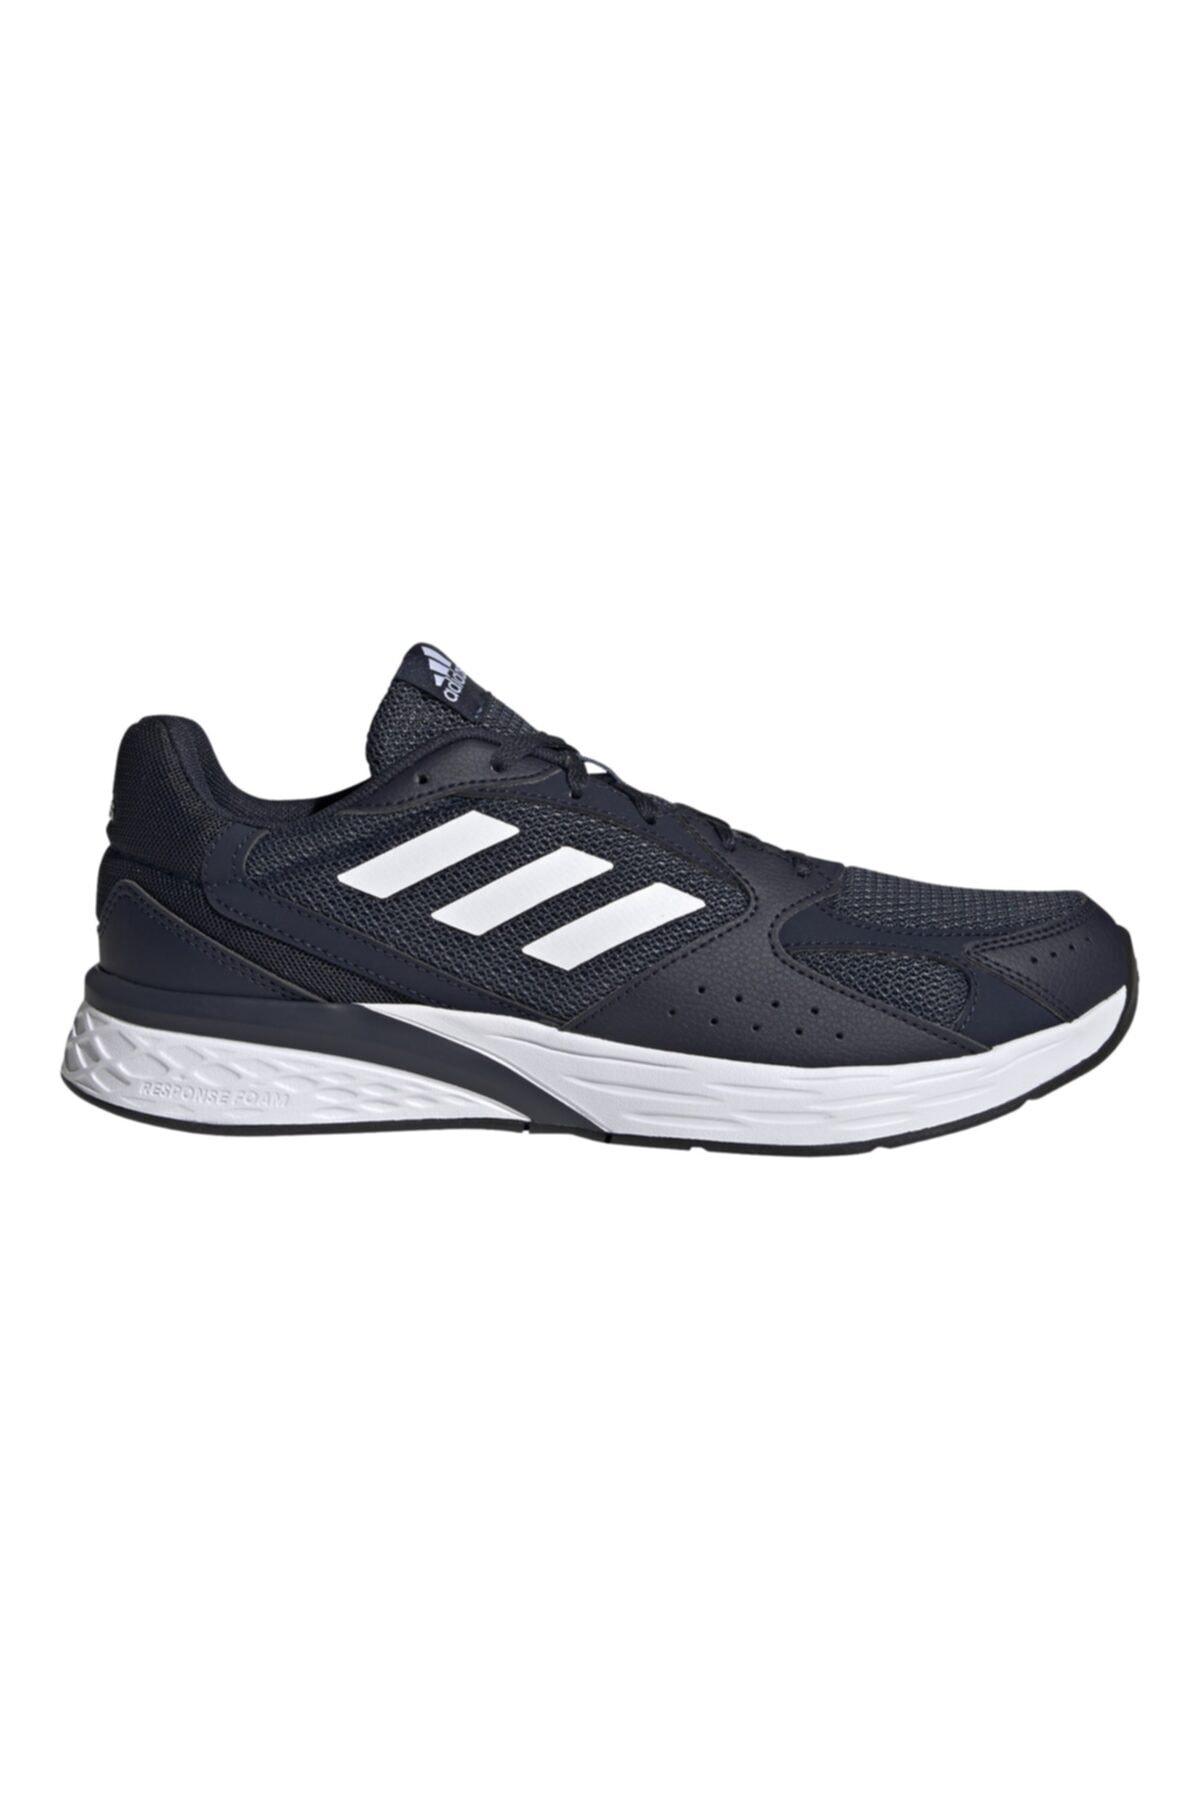 فروش پستی کفش مخصوص دویدن مردانه ترک برند آدیداس رنگ لاجوردی کد ty84629650